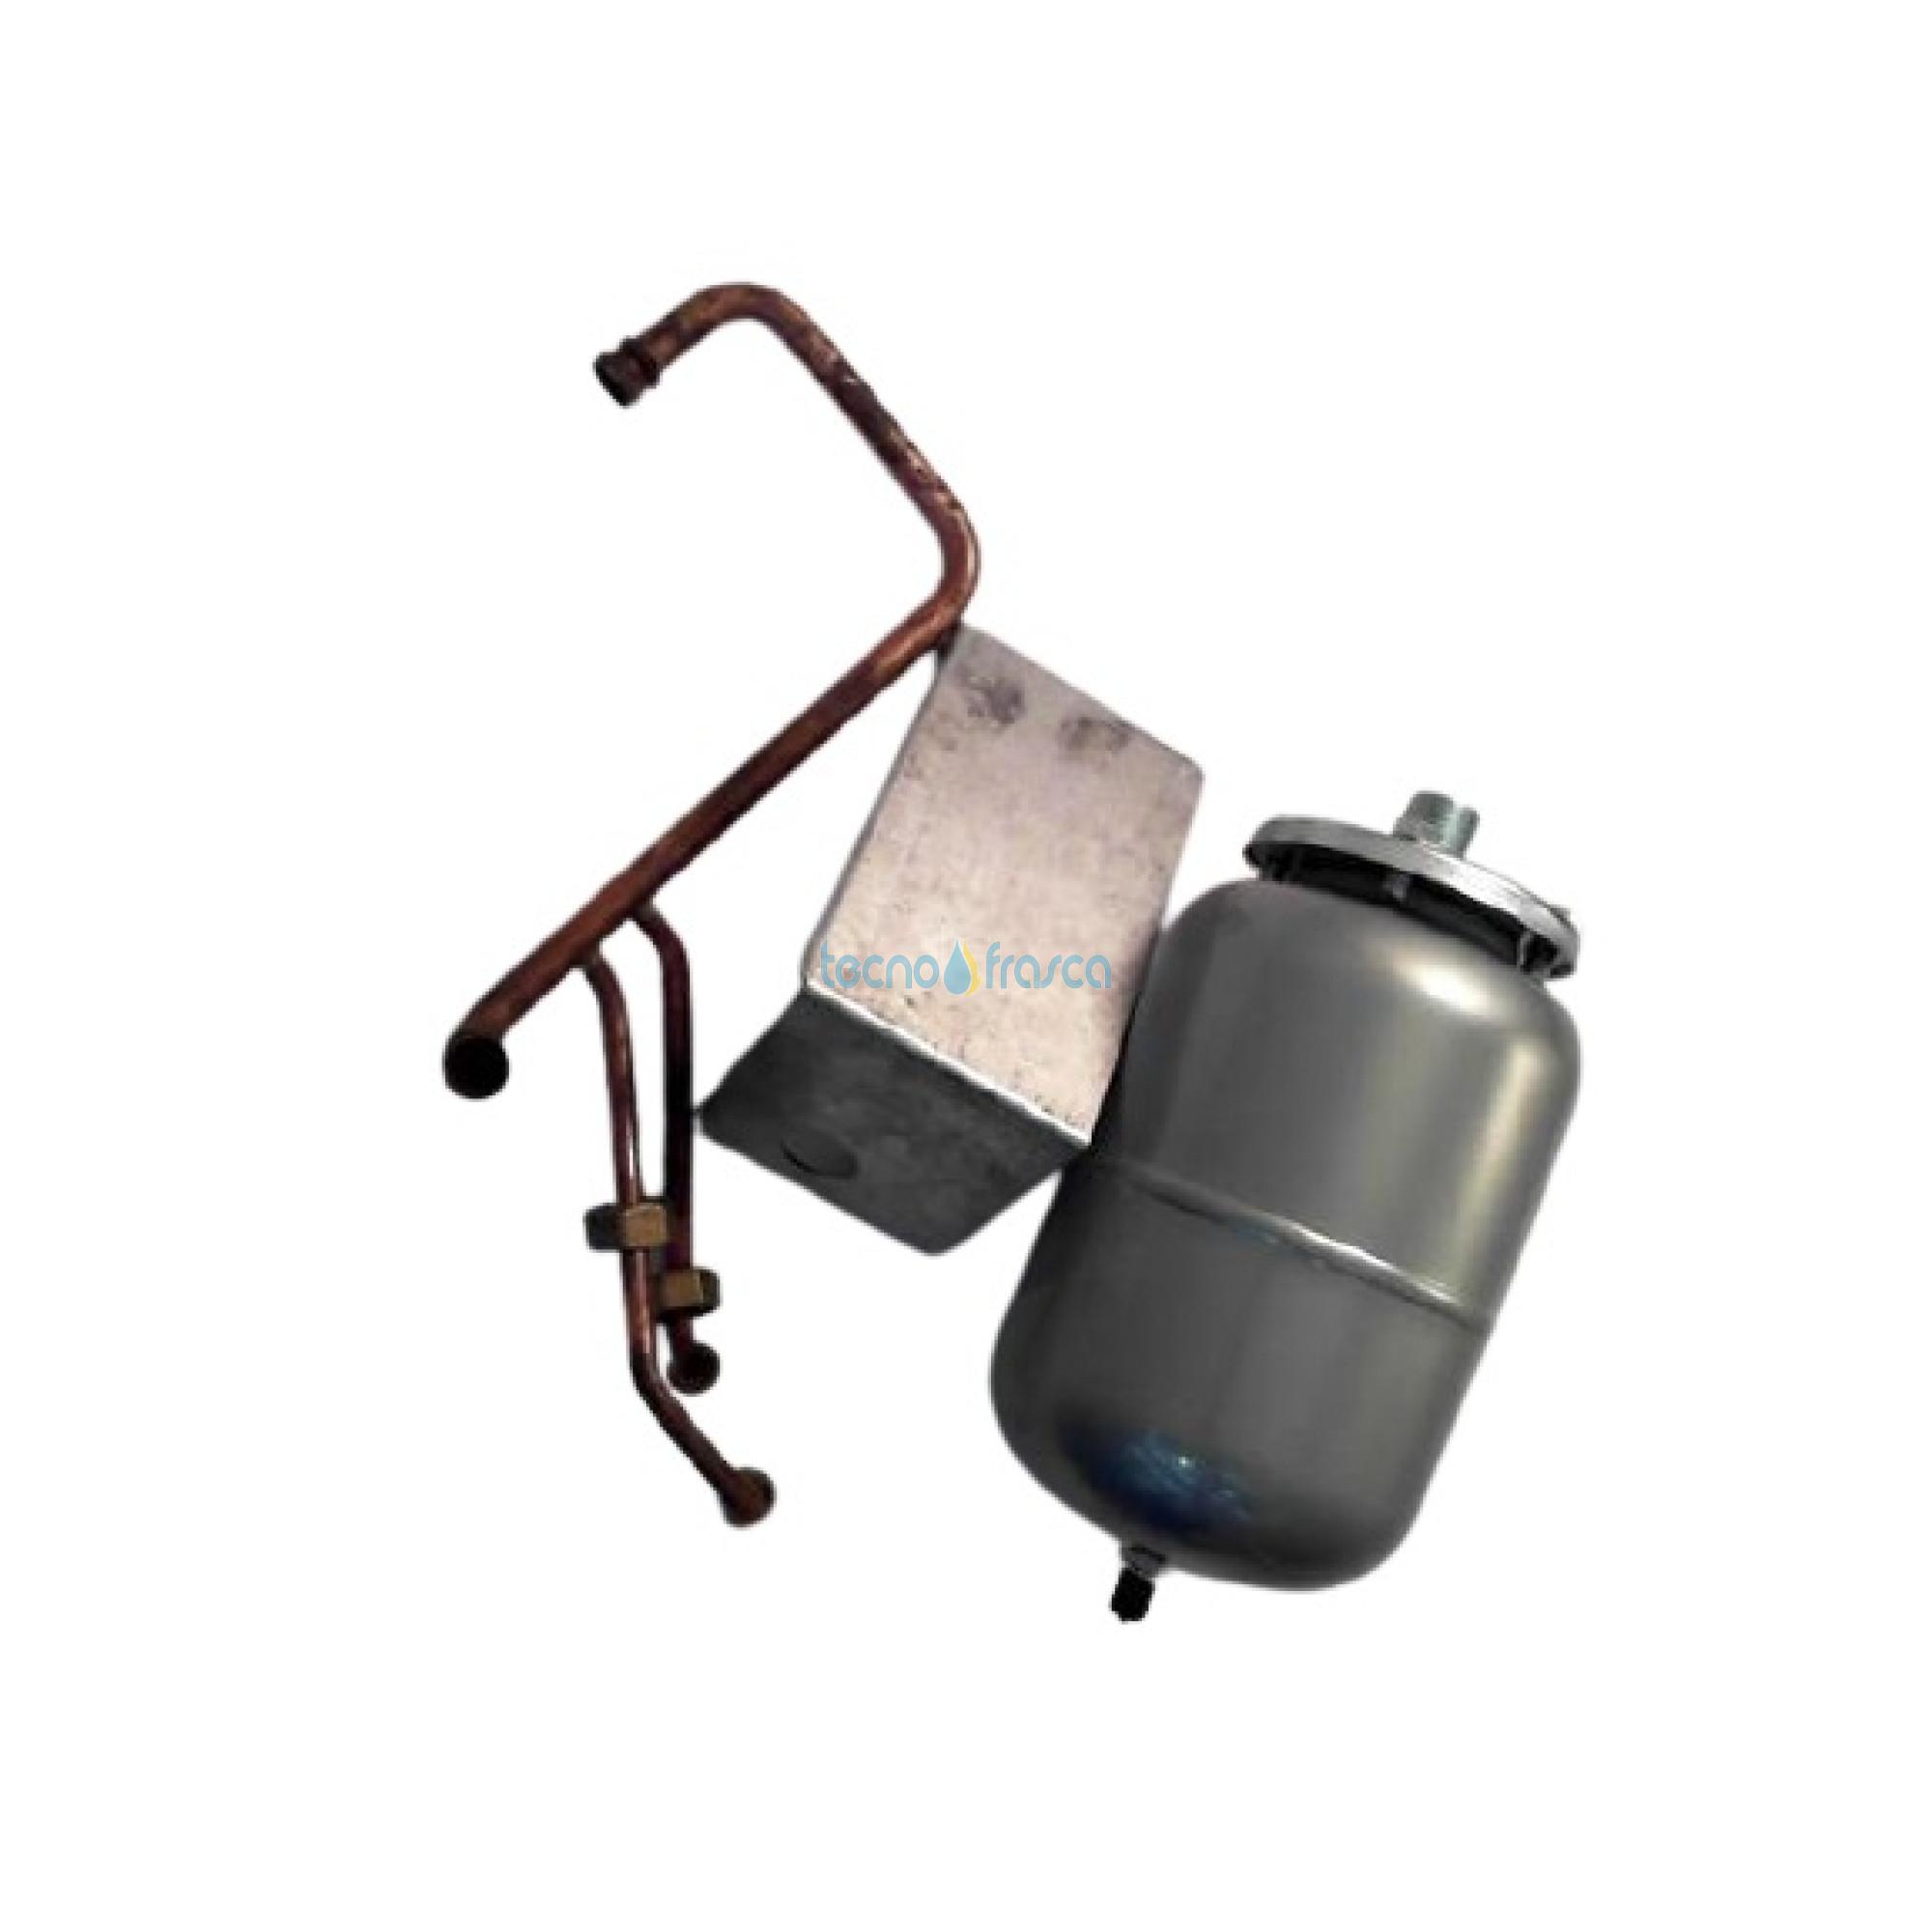 Immergas vaso di espansione lt2 nike/eolo super aqua cleris 3.012514